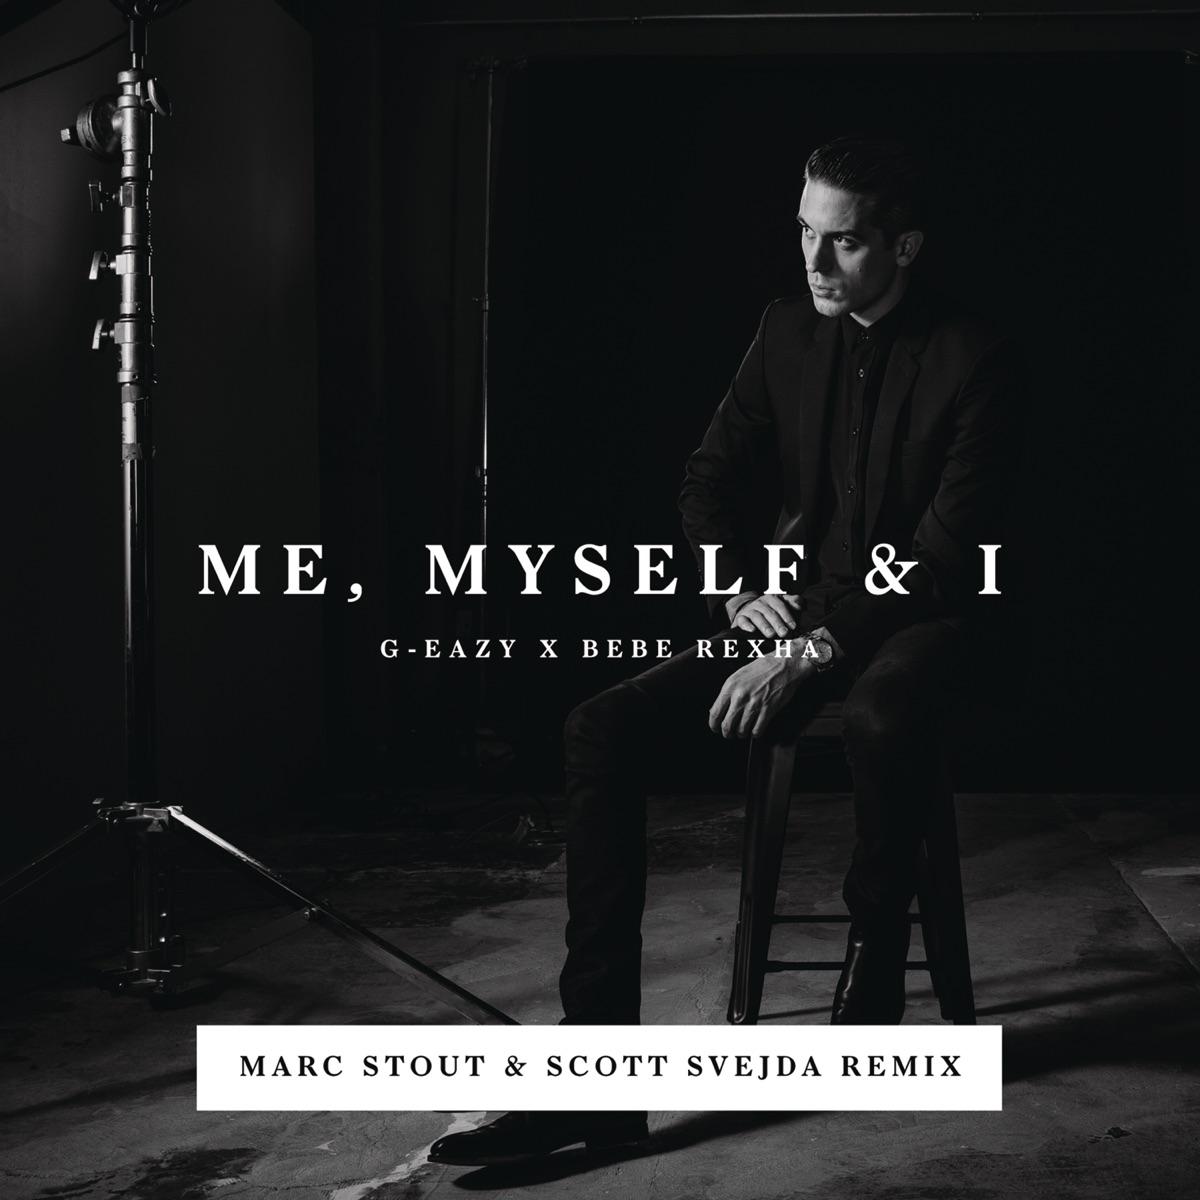 Me Myself  I Marc Stout  Scott Svejda Remix - Single G-Eazy  Bebe Rexha CD cover